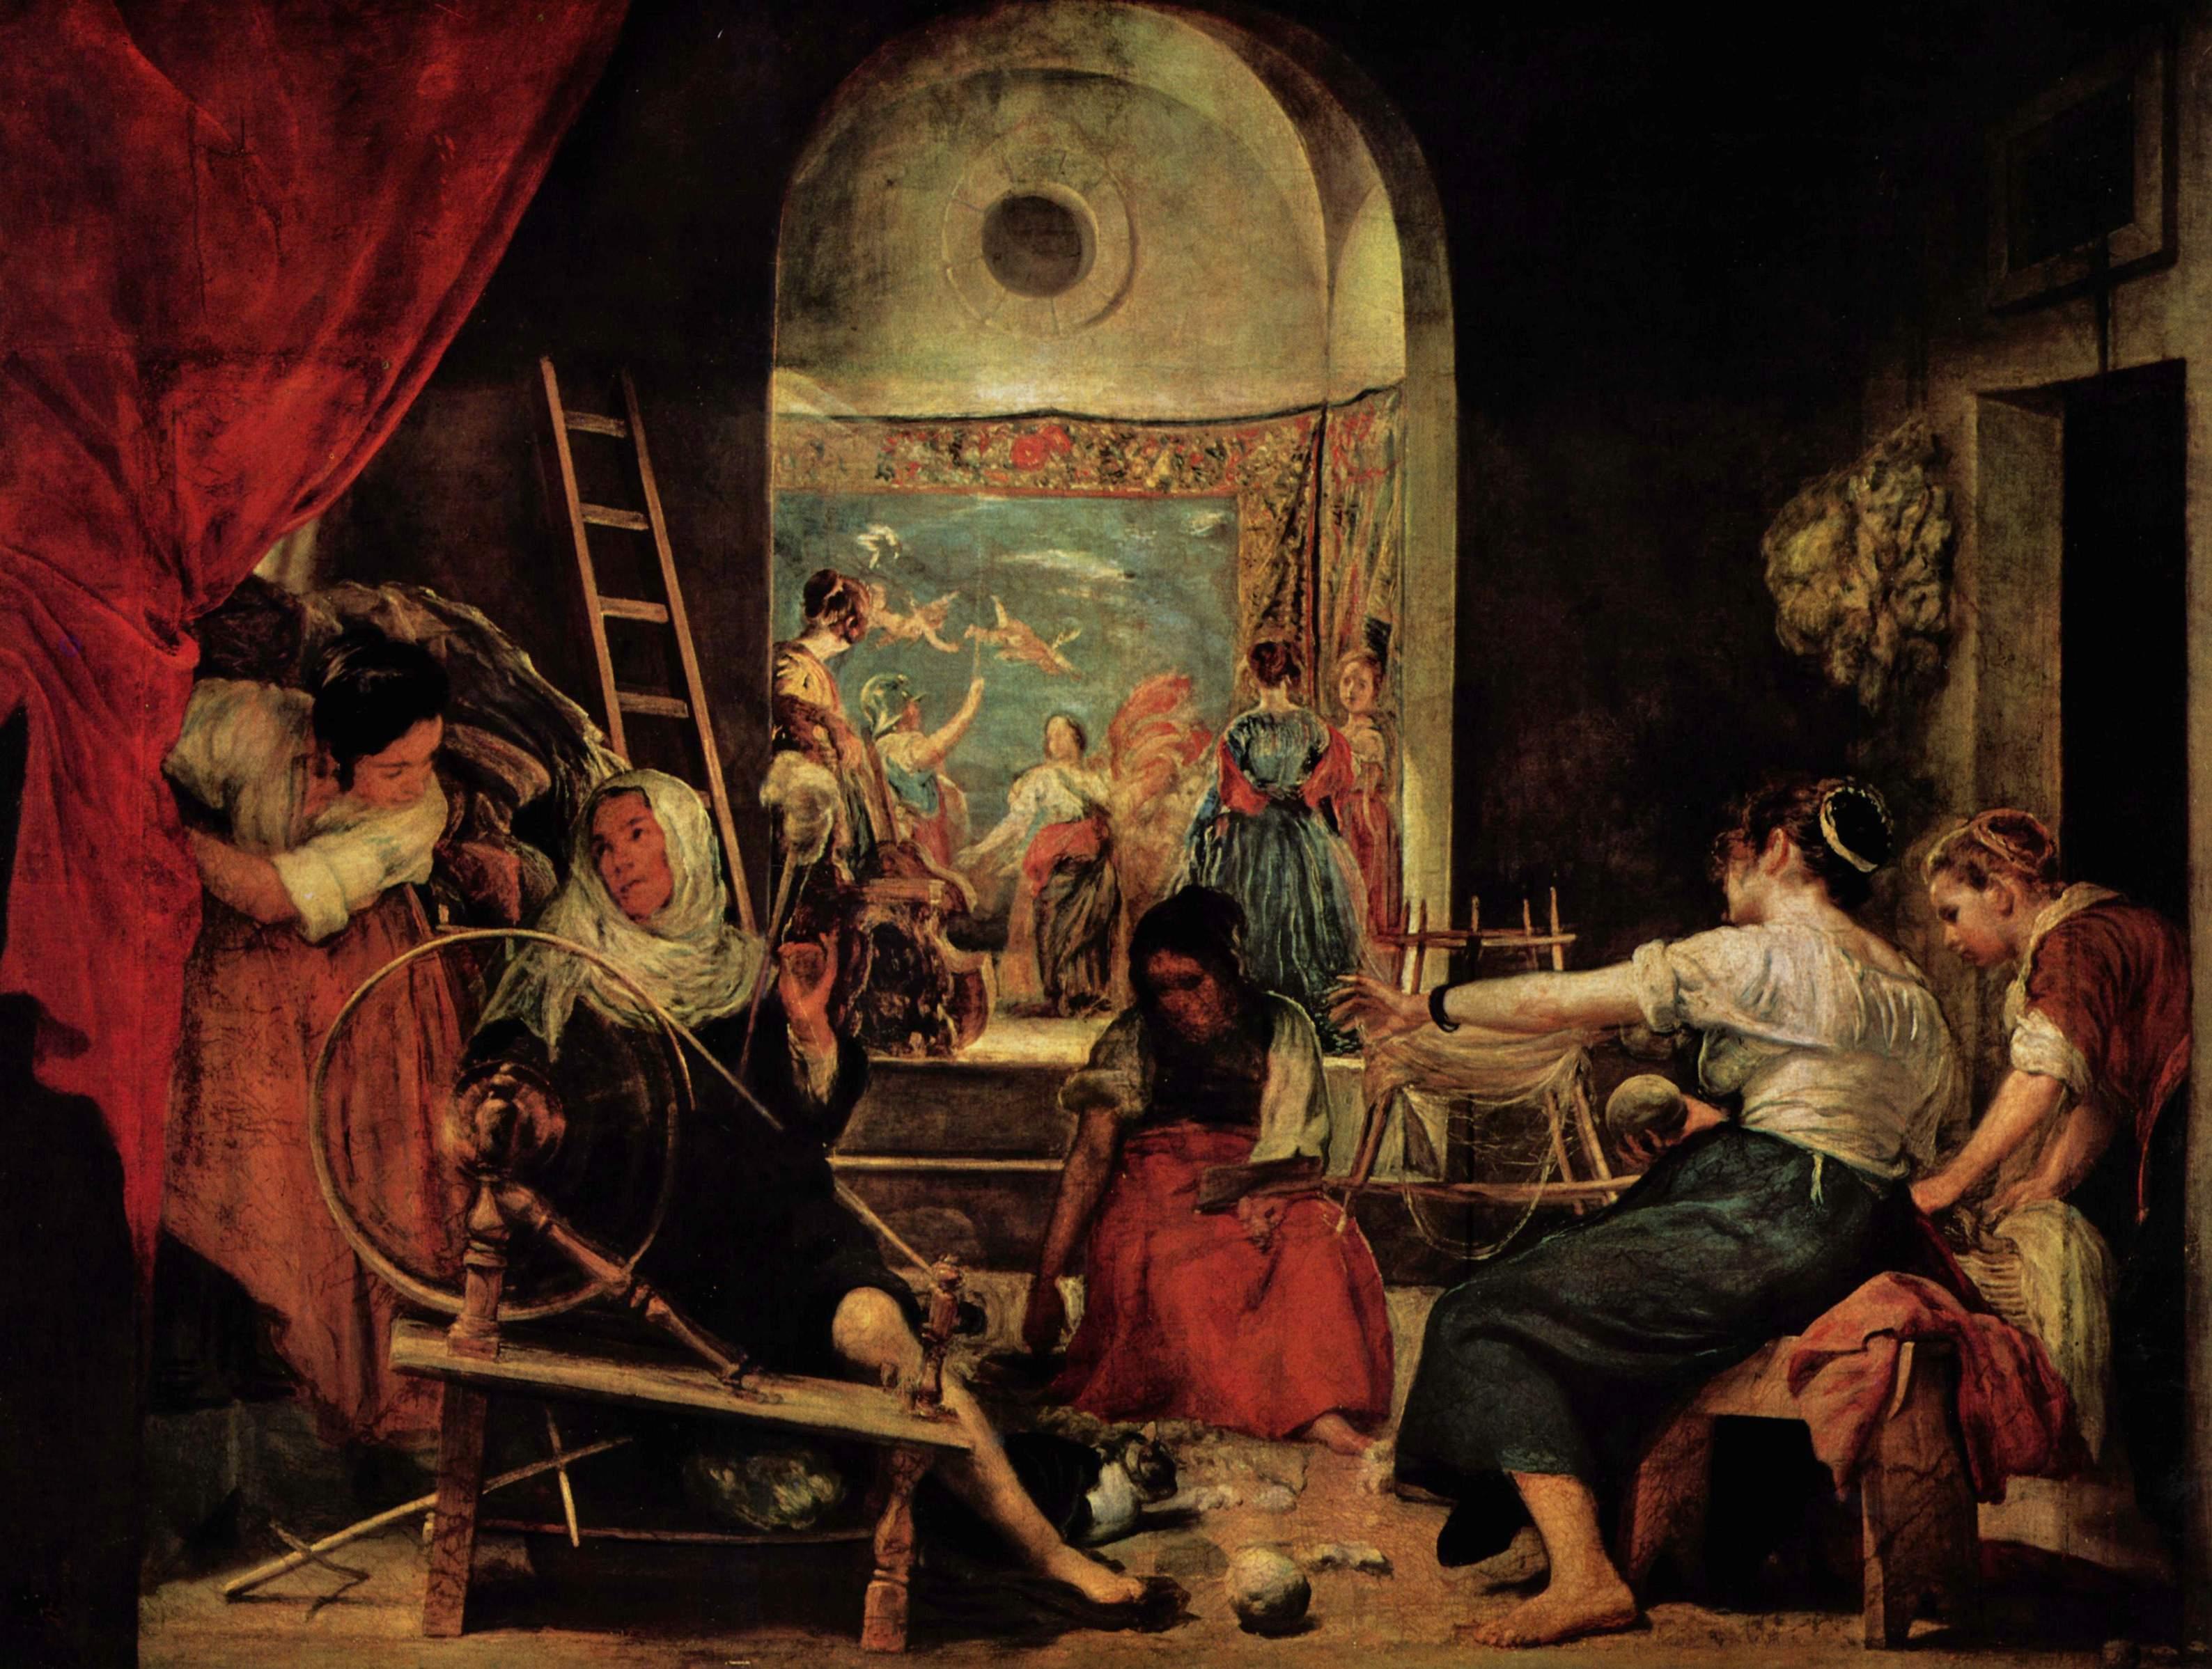 La fábula de Aracne. Velázquez. Museo del Prado. Imagen de Wikimedia Commons.